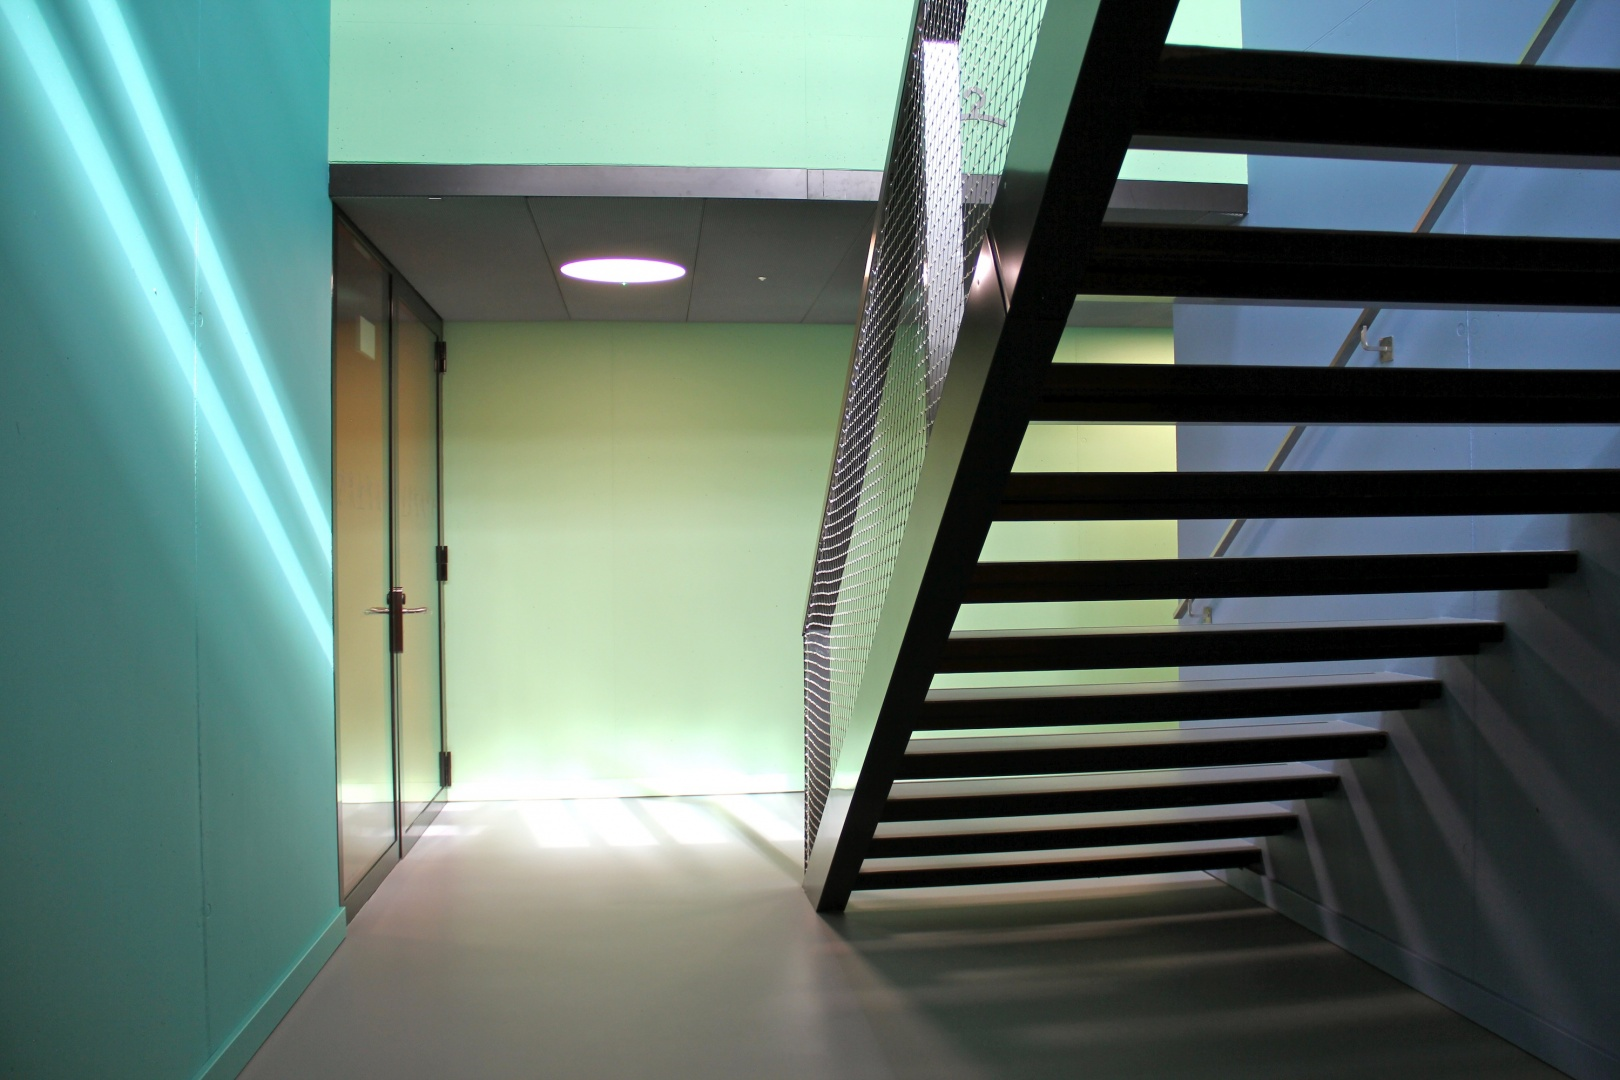 Treppenhaus UG © keiserwerk